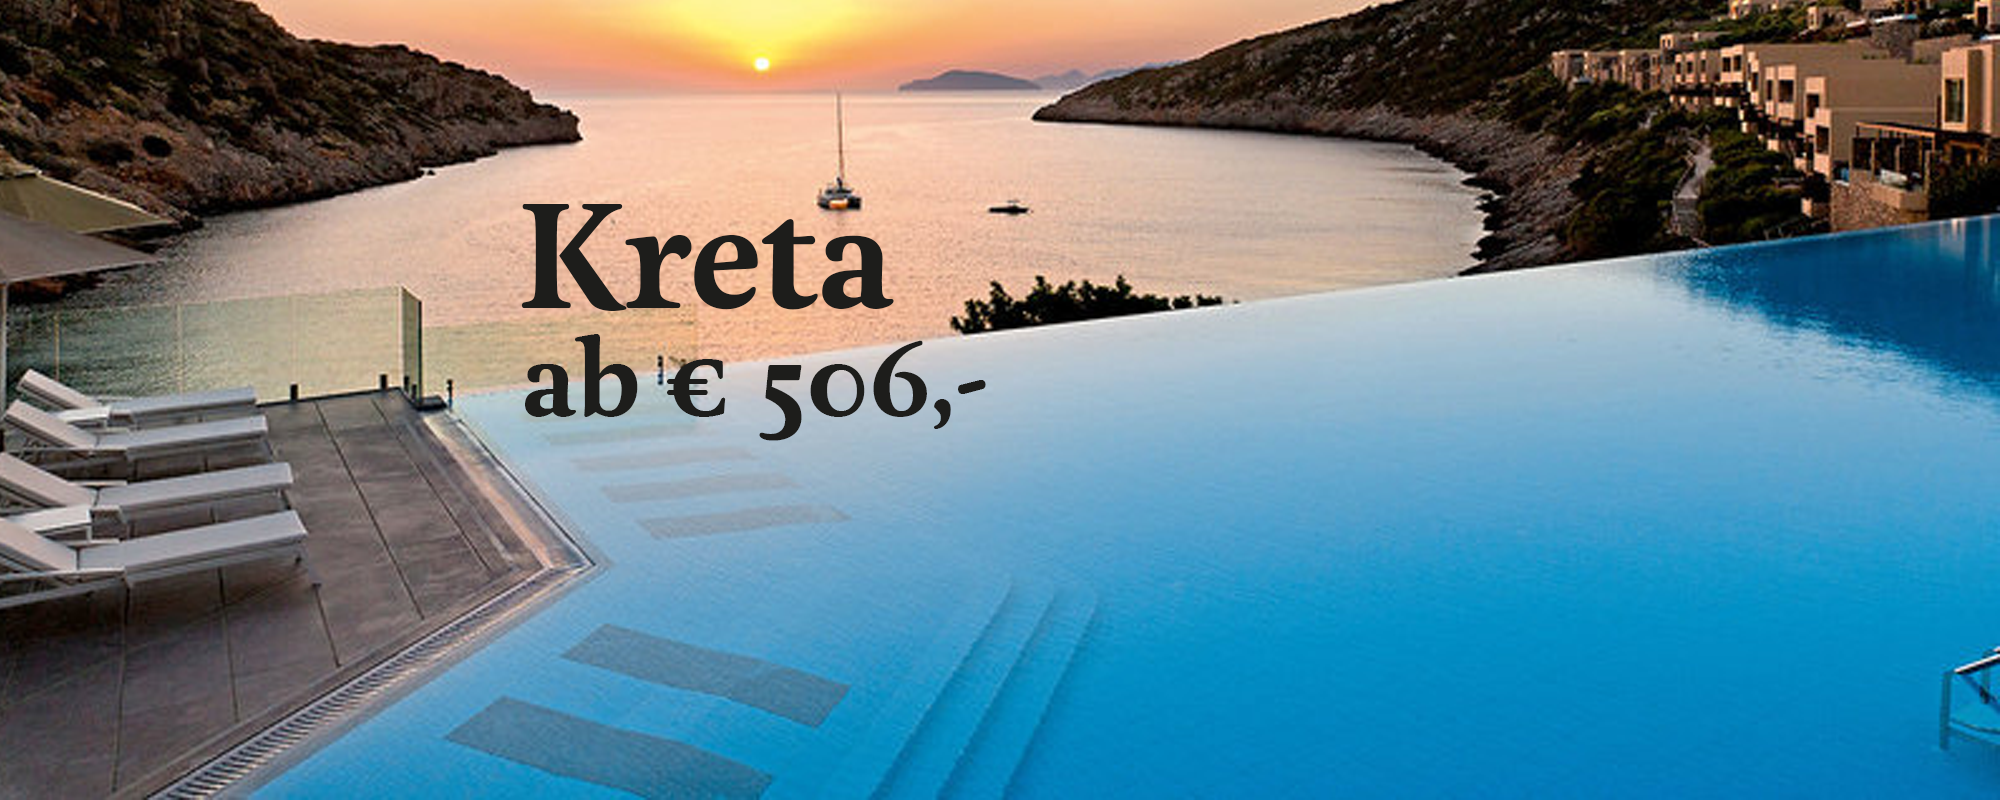 Kreta Angebote